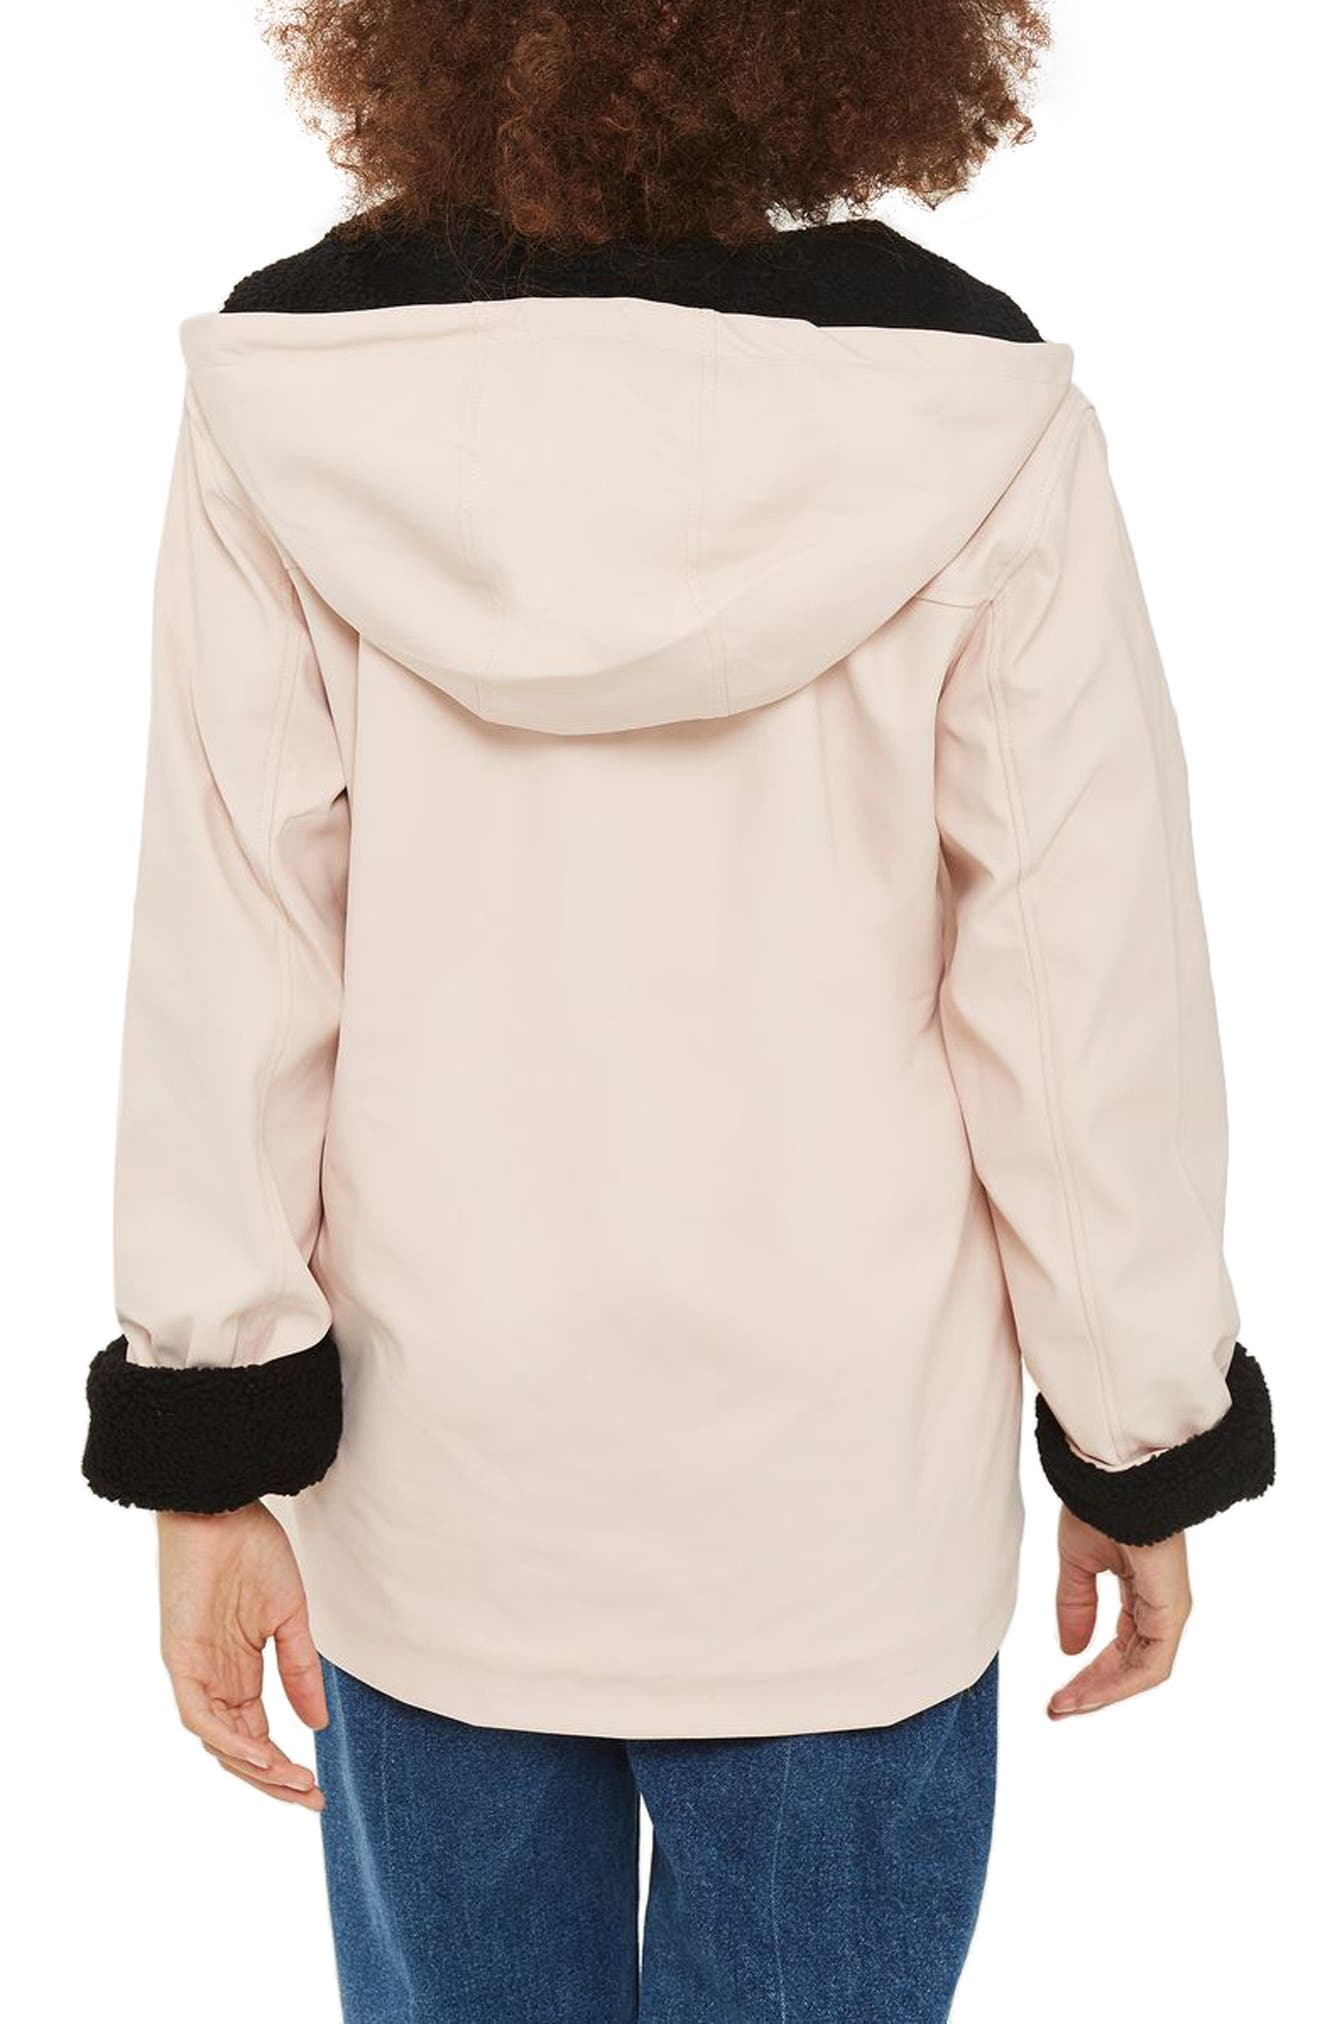 Hooded Raincoat,                             Alternate thumbnail 2, color,                             Light Pink Multi